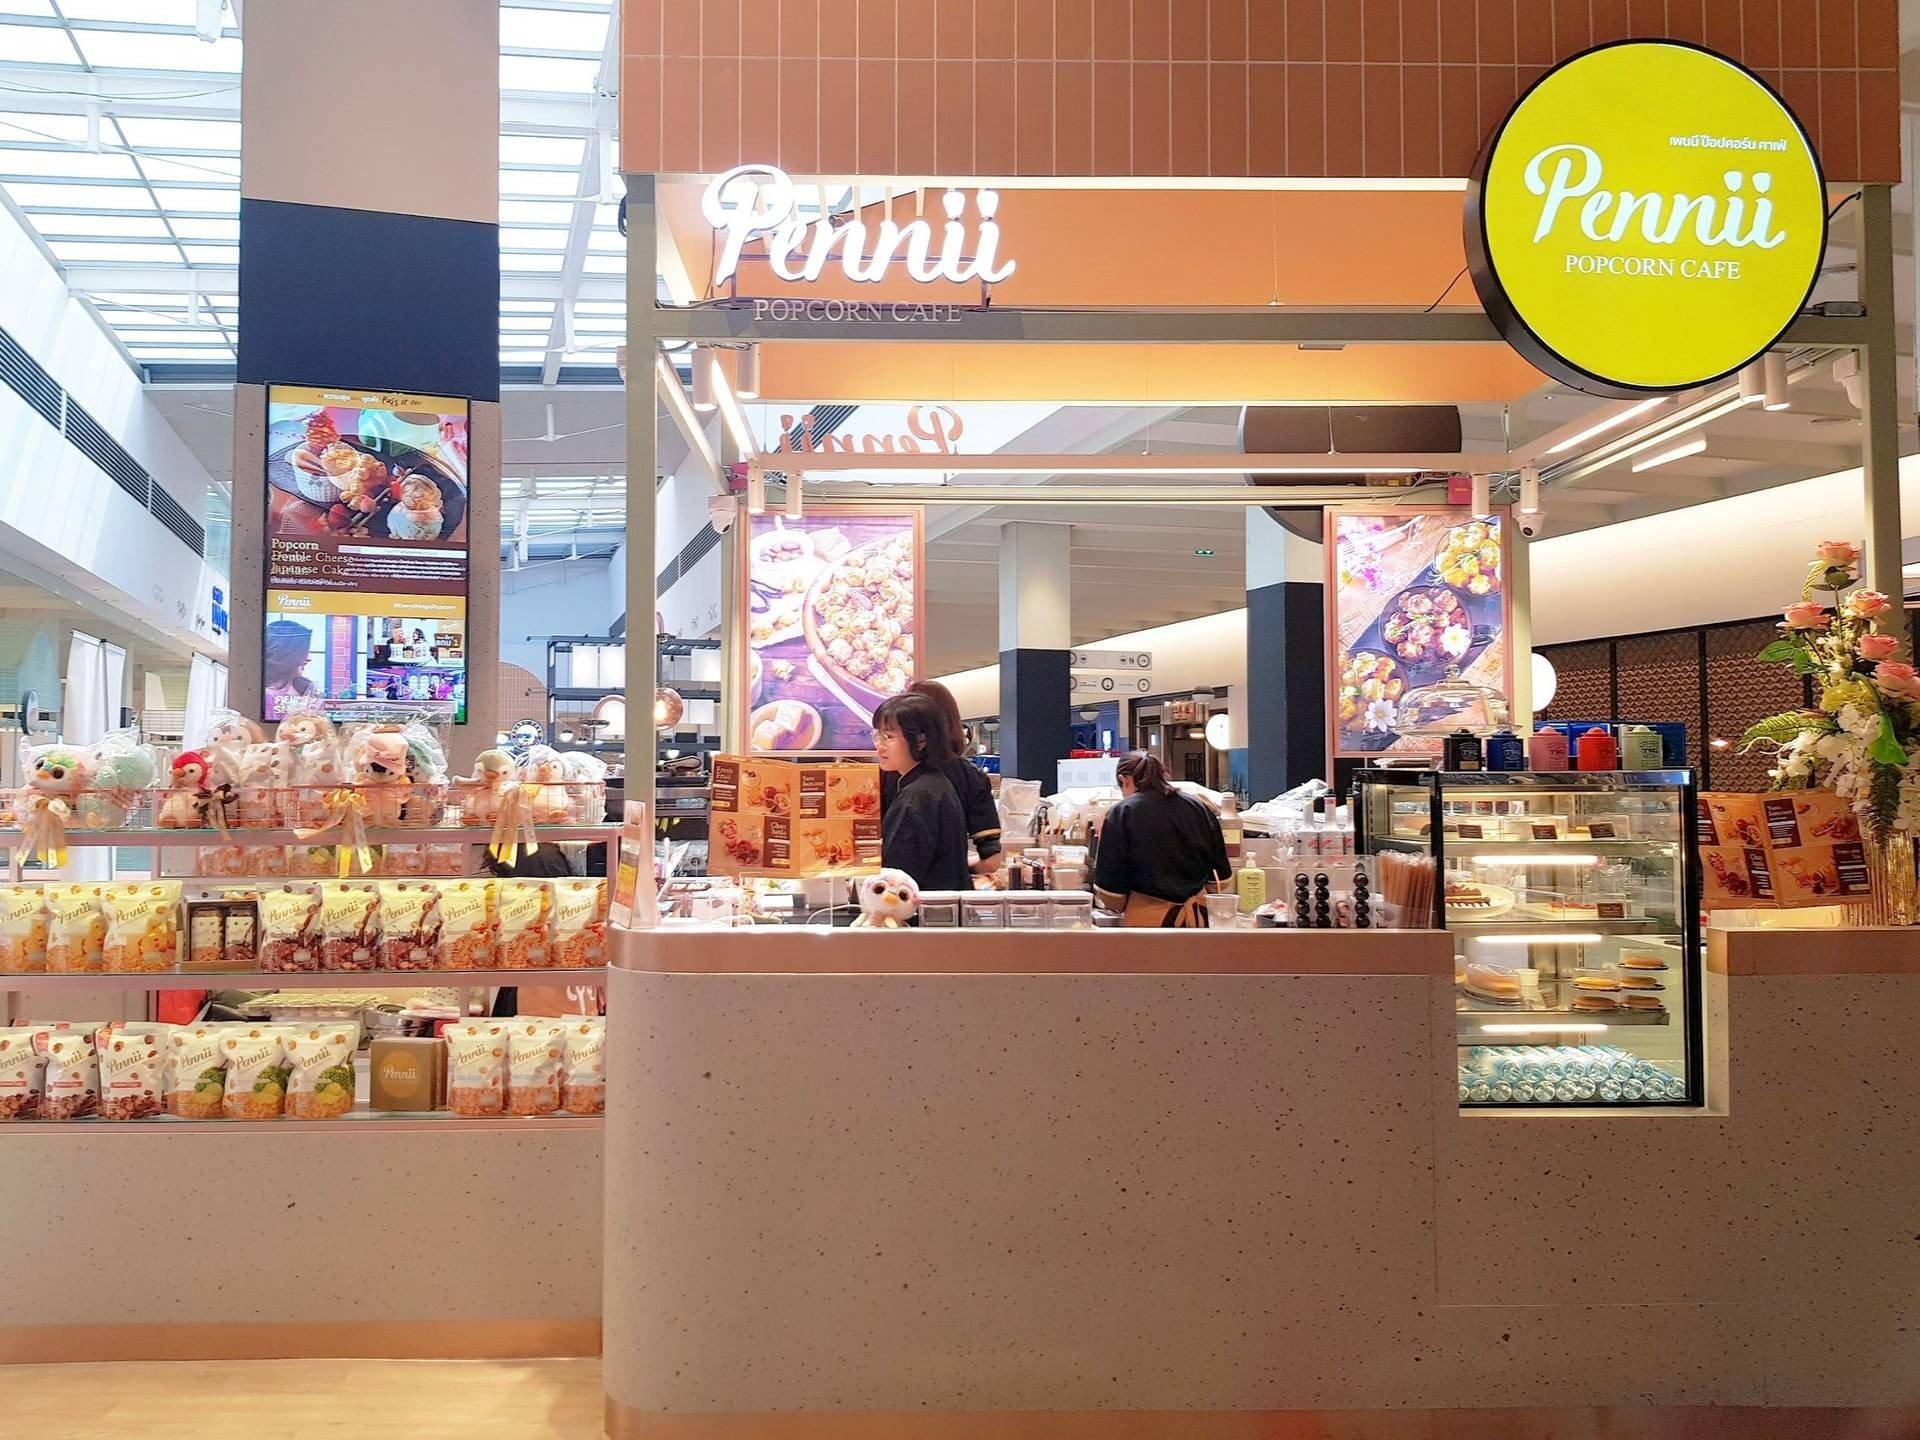 Pennii Popcorn Cafe centralwOrld